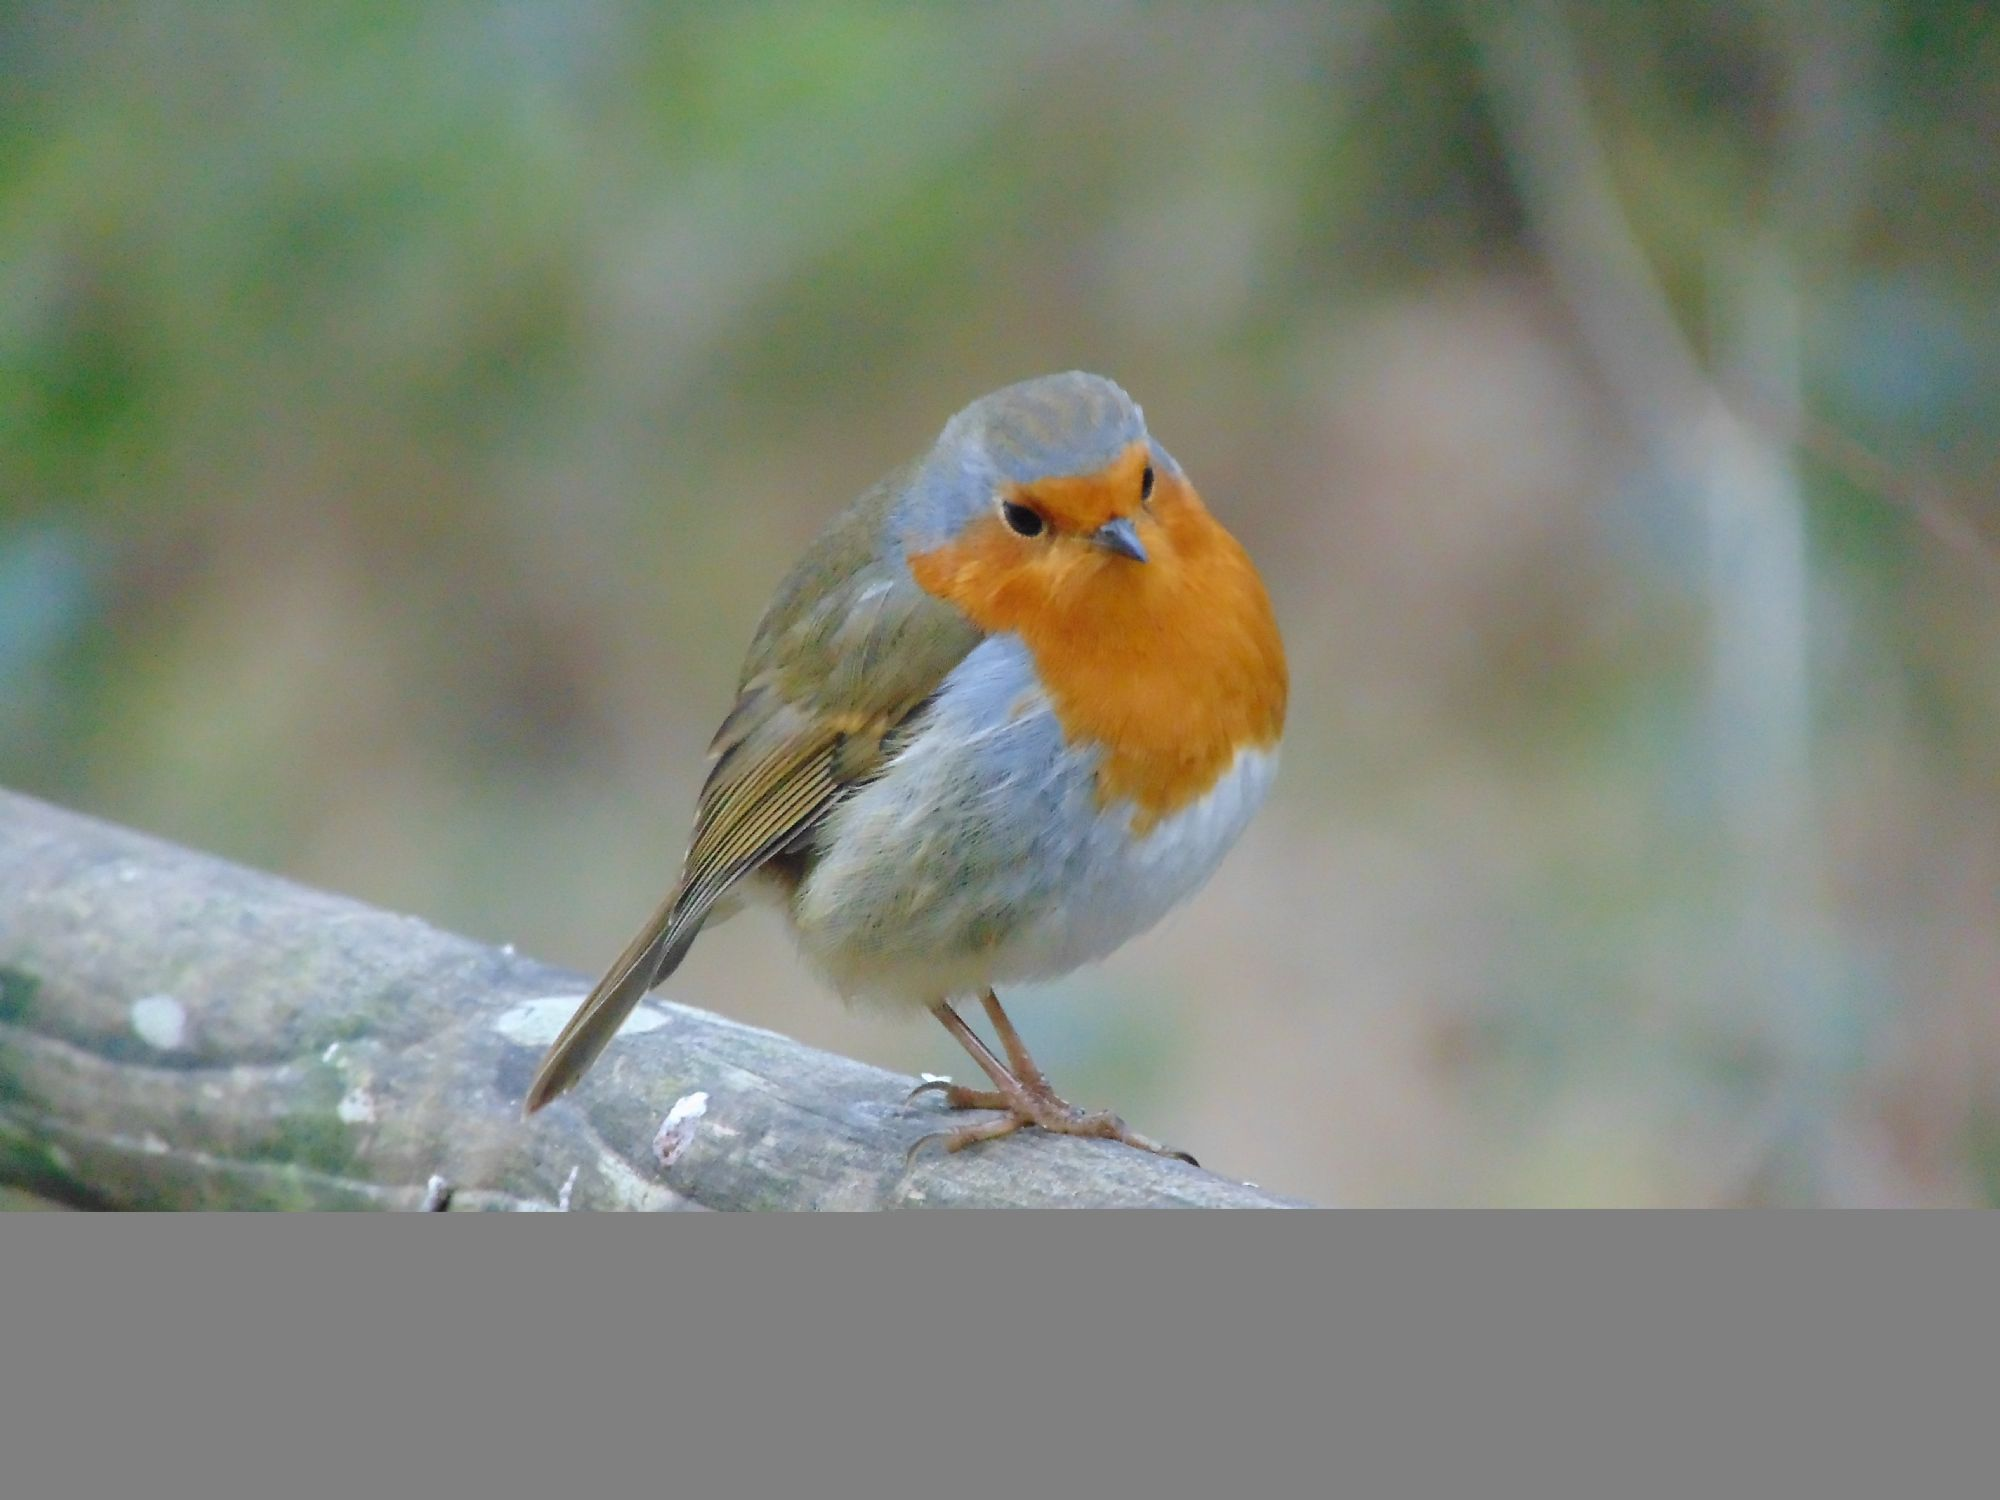 Friendly wee robin